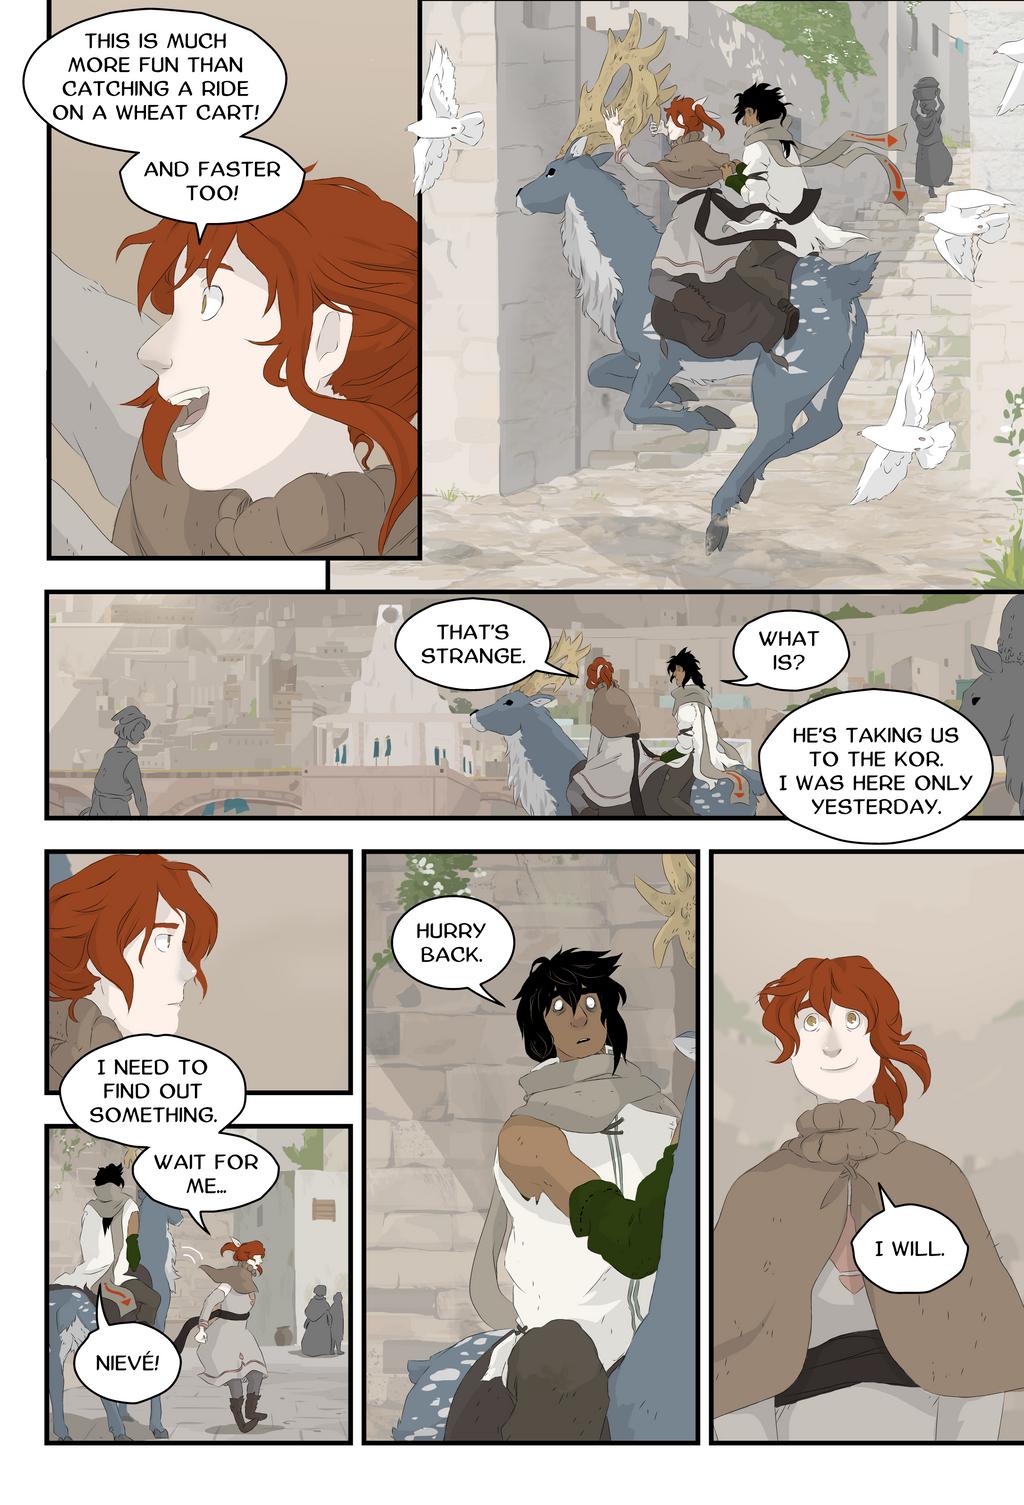 Nightbreak Chapter 6 Page 18 by Talishu